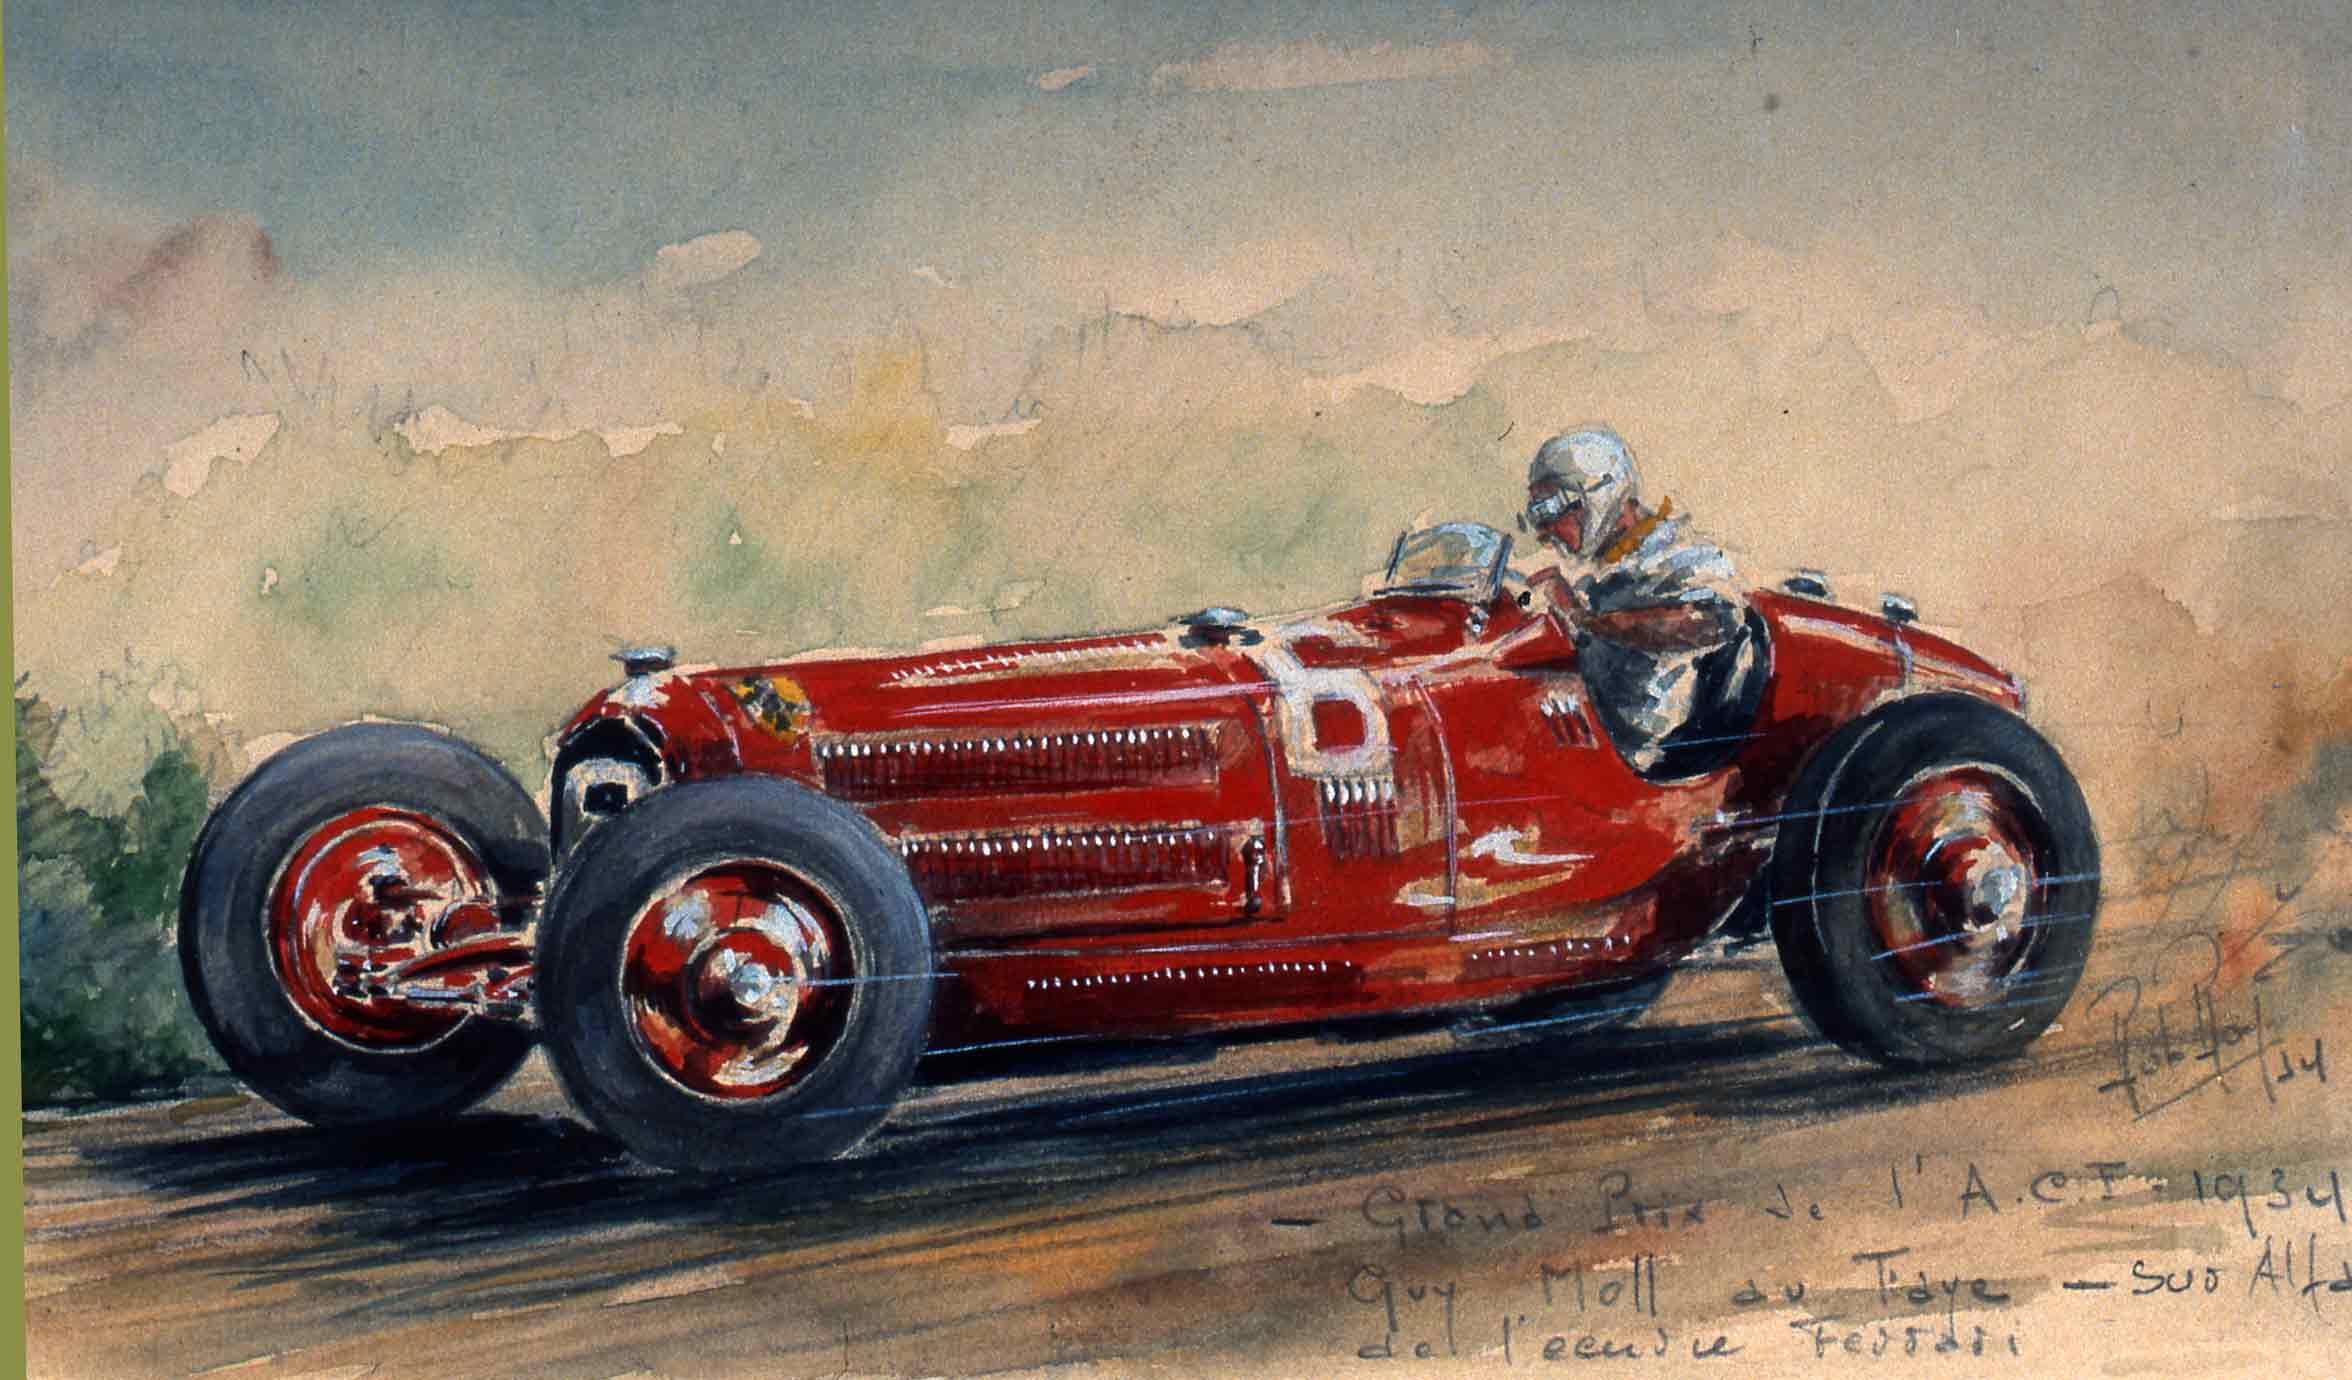 Grand Prix ACF 1934